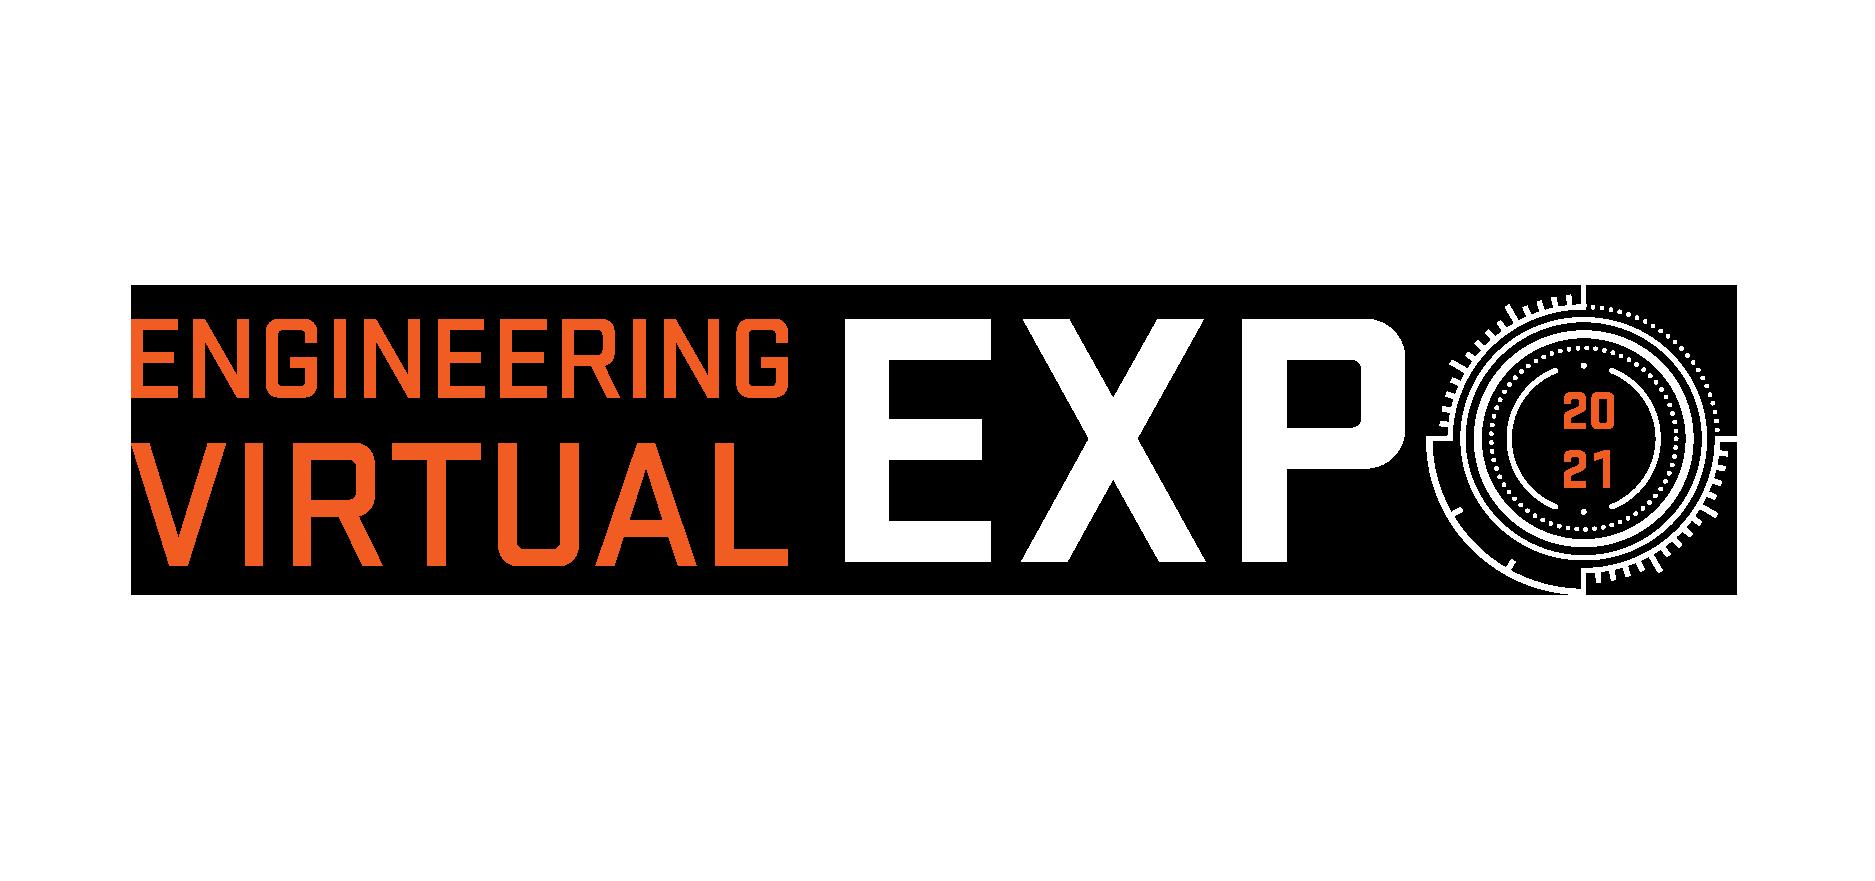 Engineering Virtual Expo